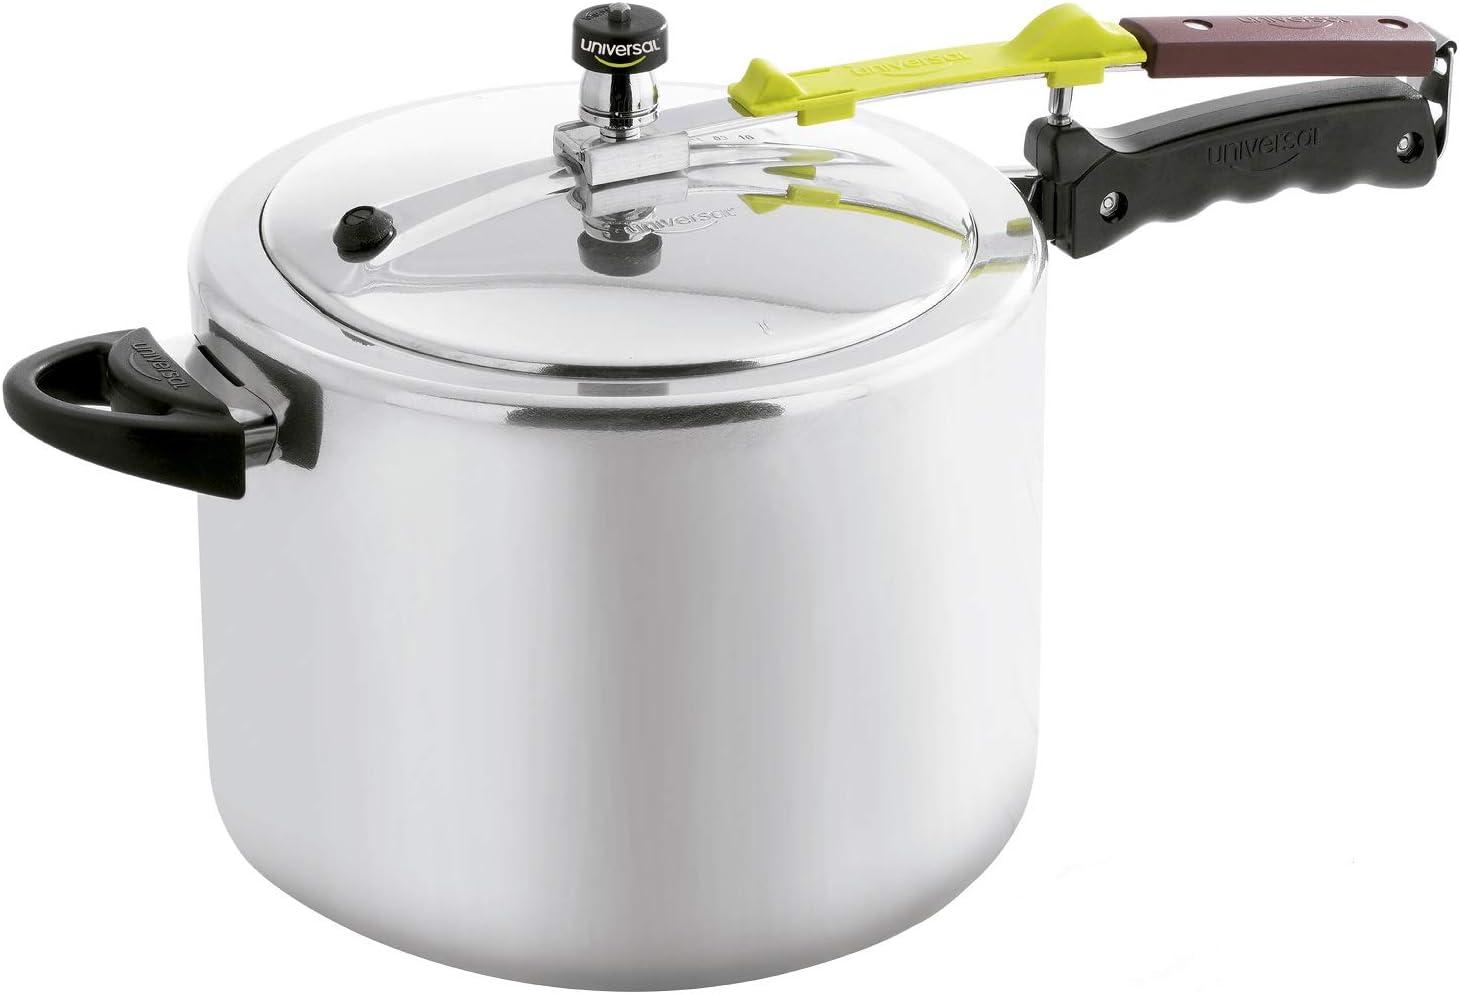 Universal Pressure cooker 8 liters / 8.3 Qt